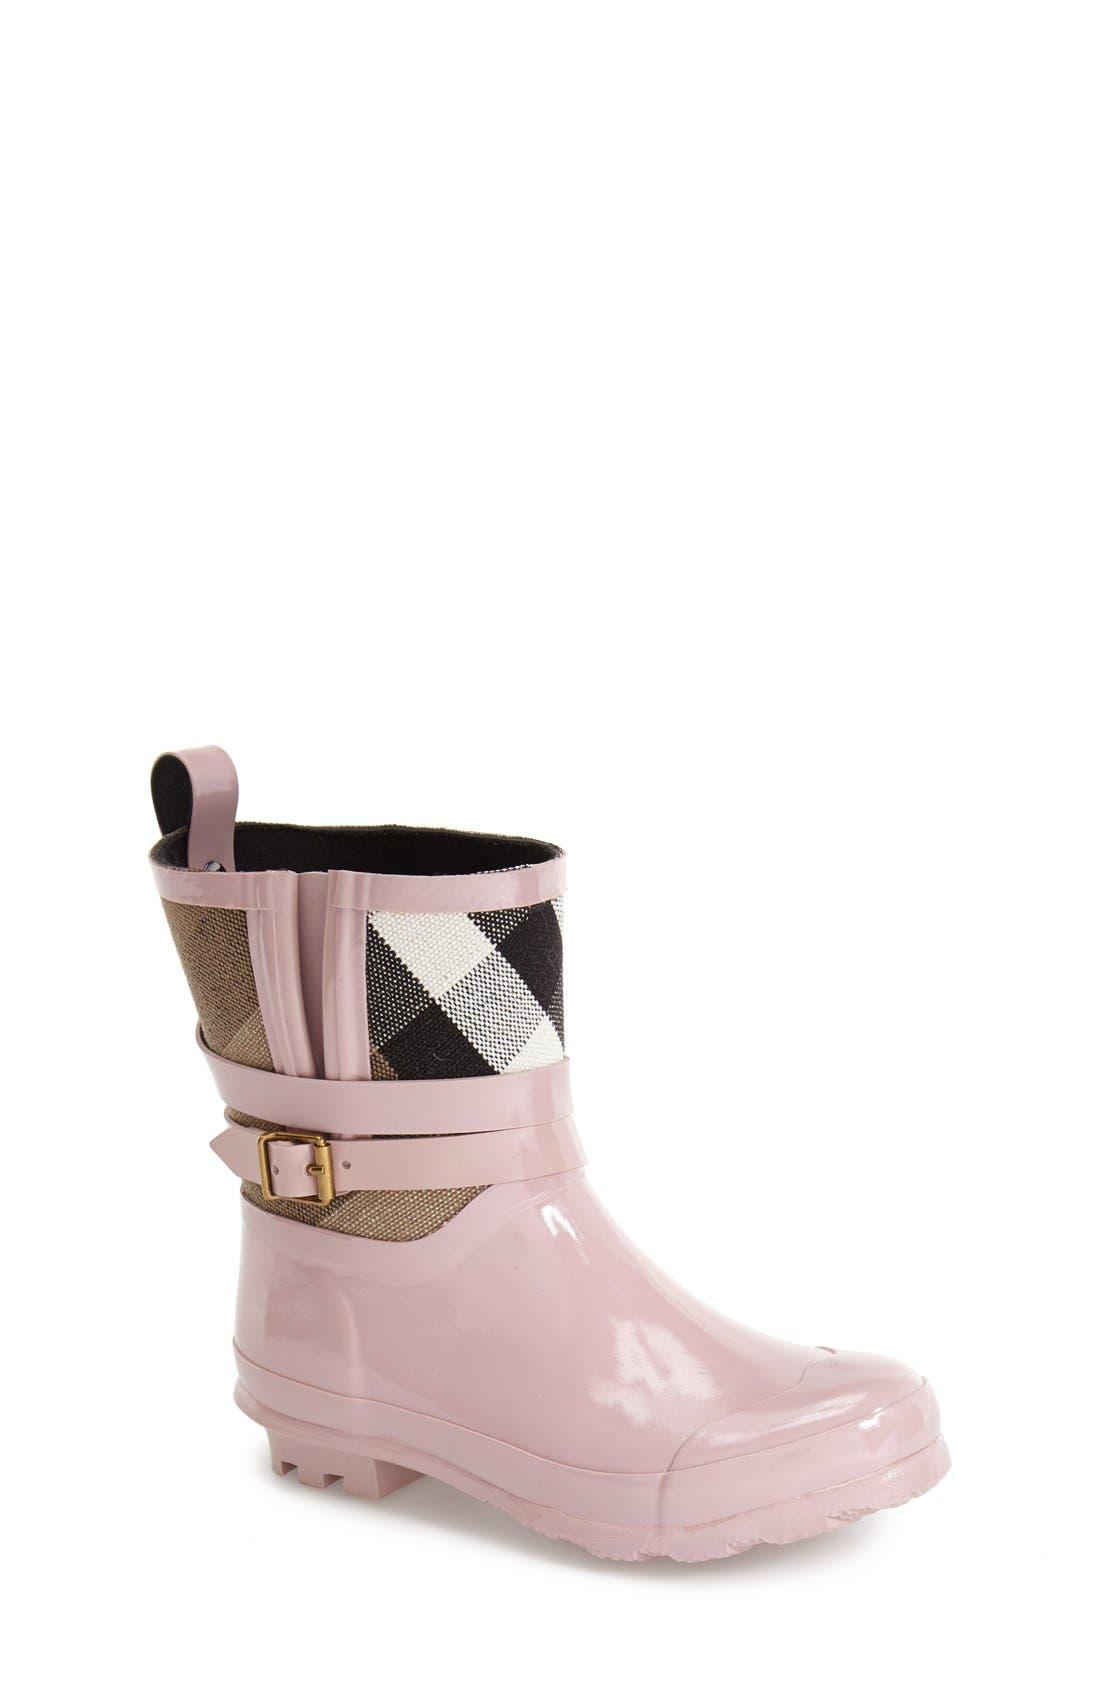 Main Image - Burberry 'Holloway' Rain Boot (Toddler & Little Kid)